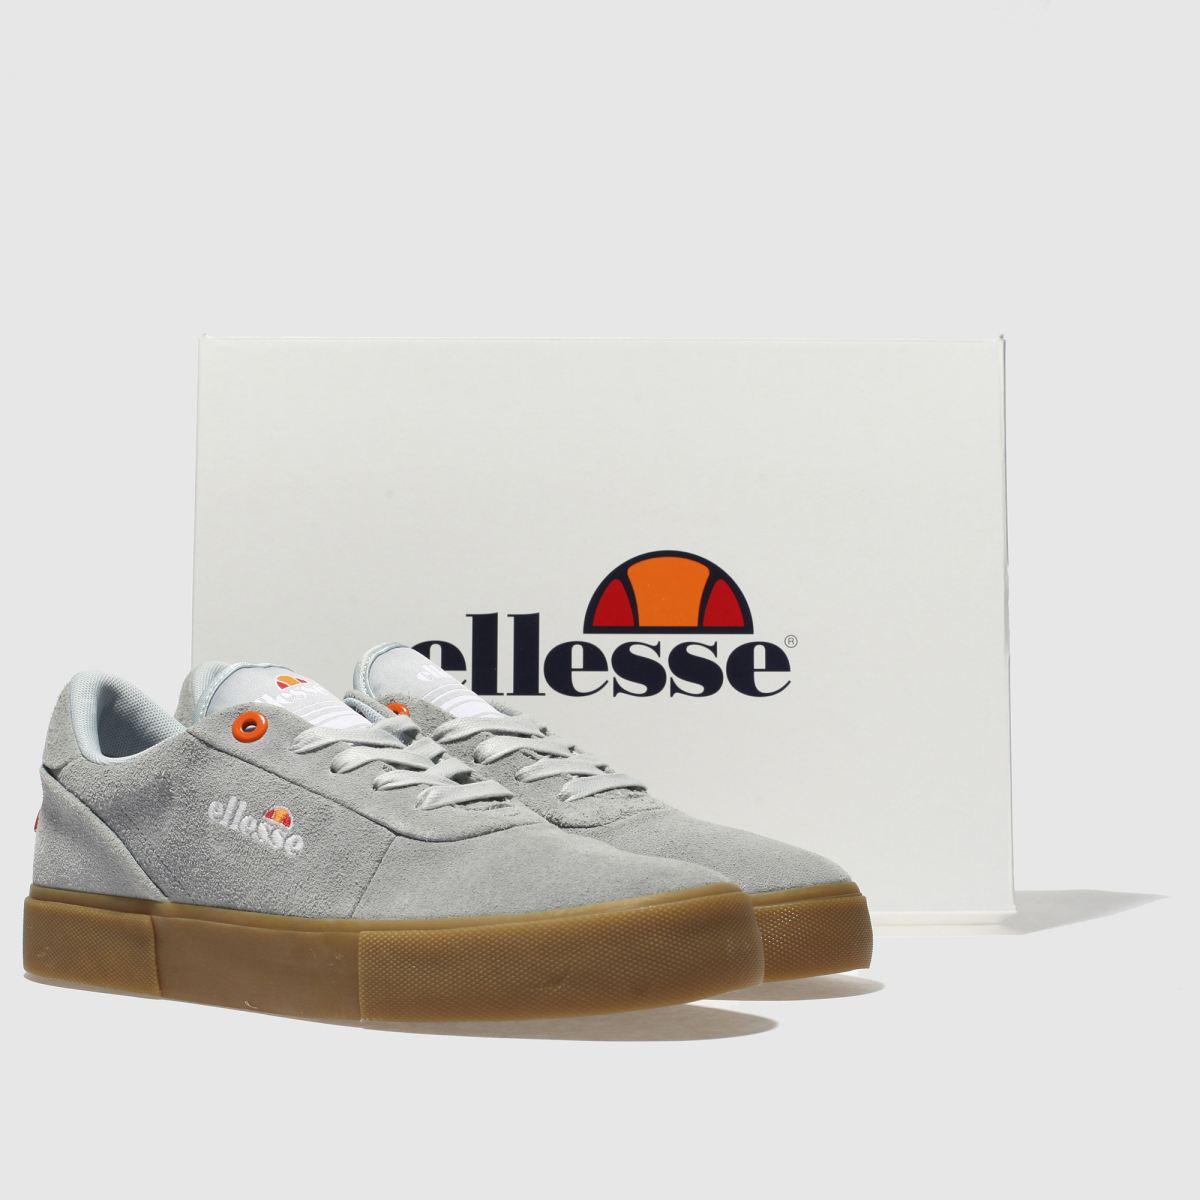 Damen Hellblau ellesse Alto Suede Sneaker | Schuhe schuh Gute Qualität beliebte Schuhe | e1e4bc